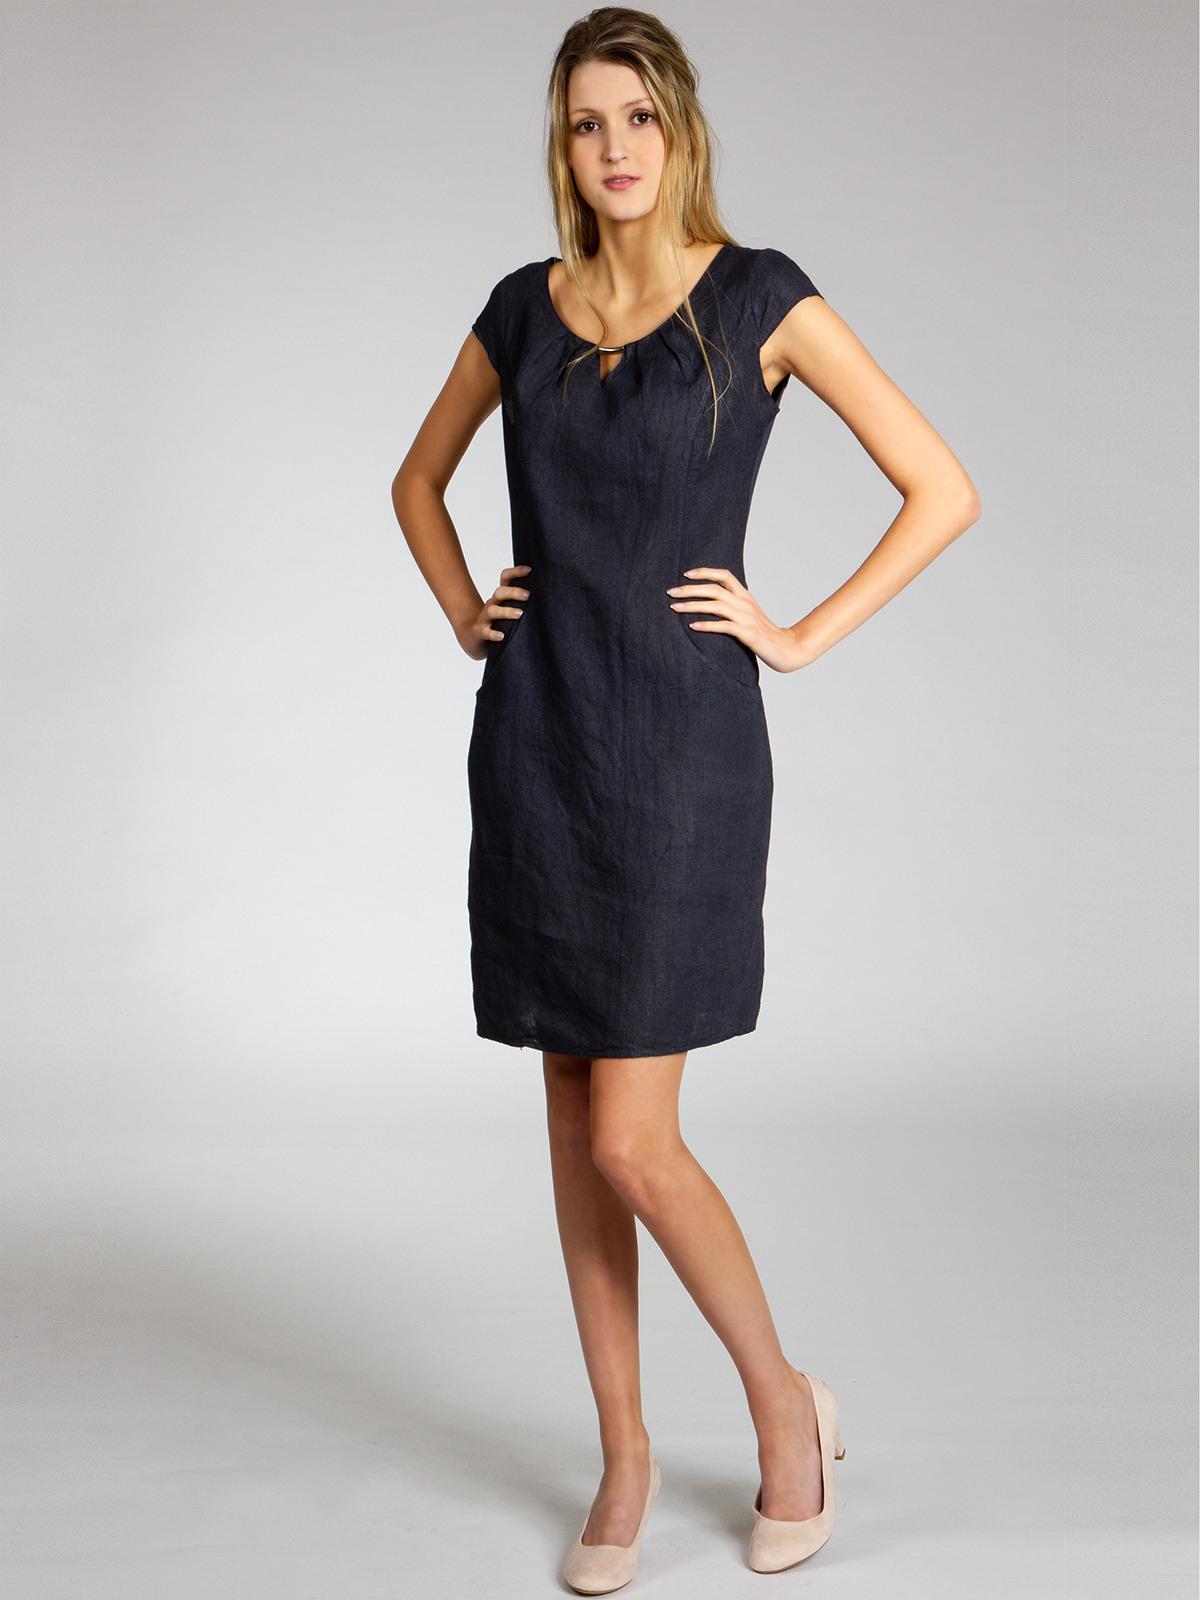 Caspar Skl020 Damen Sommer Kleid Leinenkleid Knielang